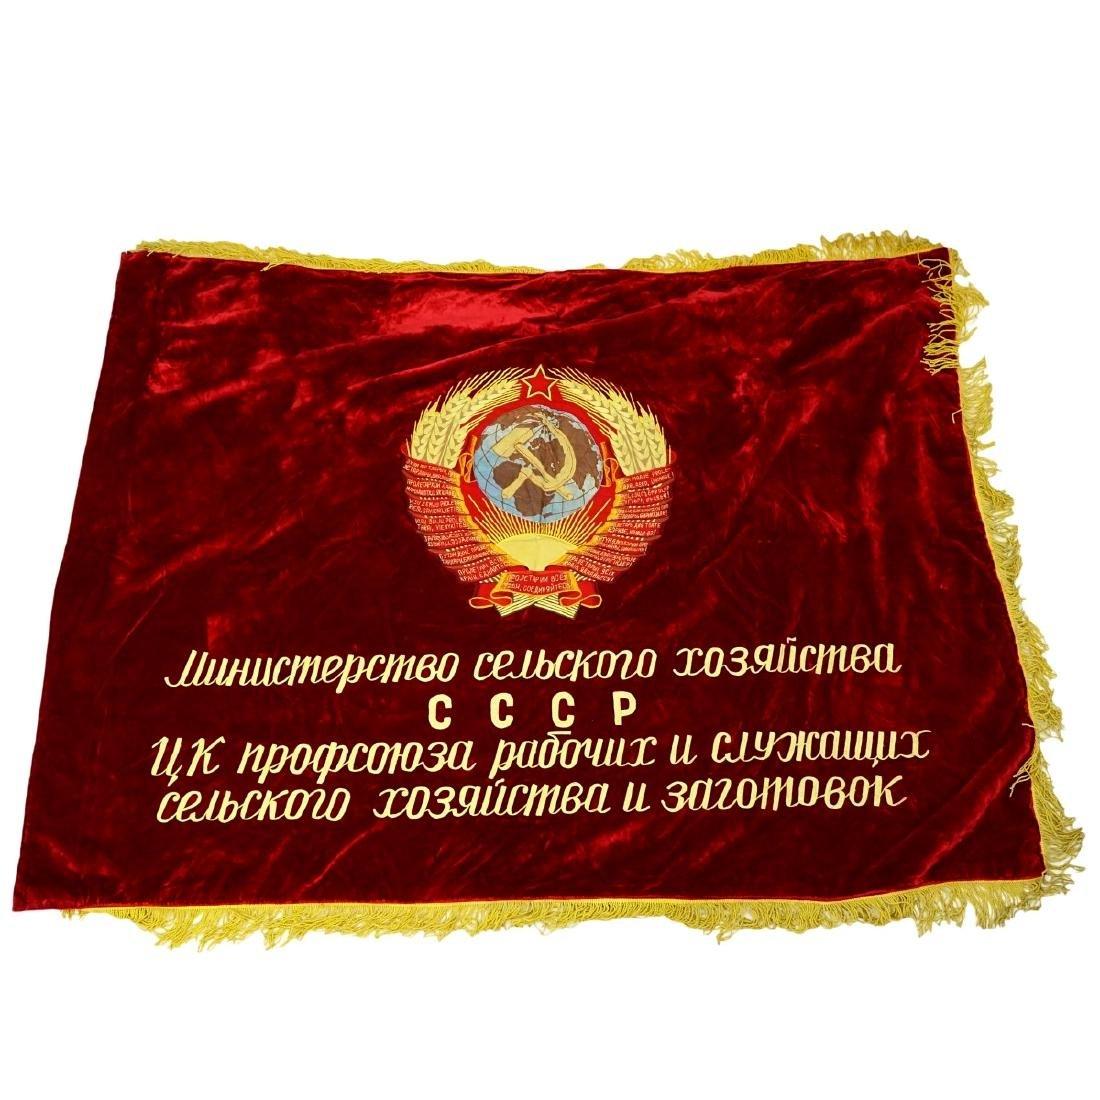 20th Century Russian Soviet Era Lenin-CCCP - 4